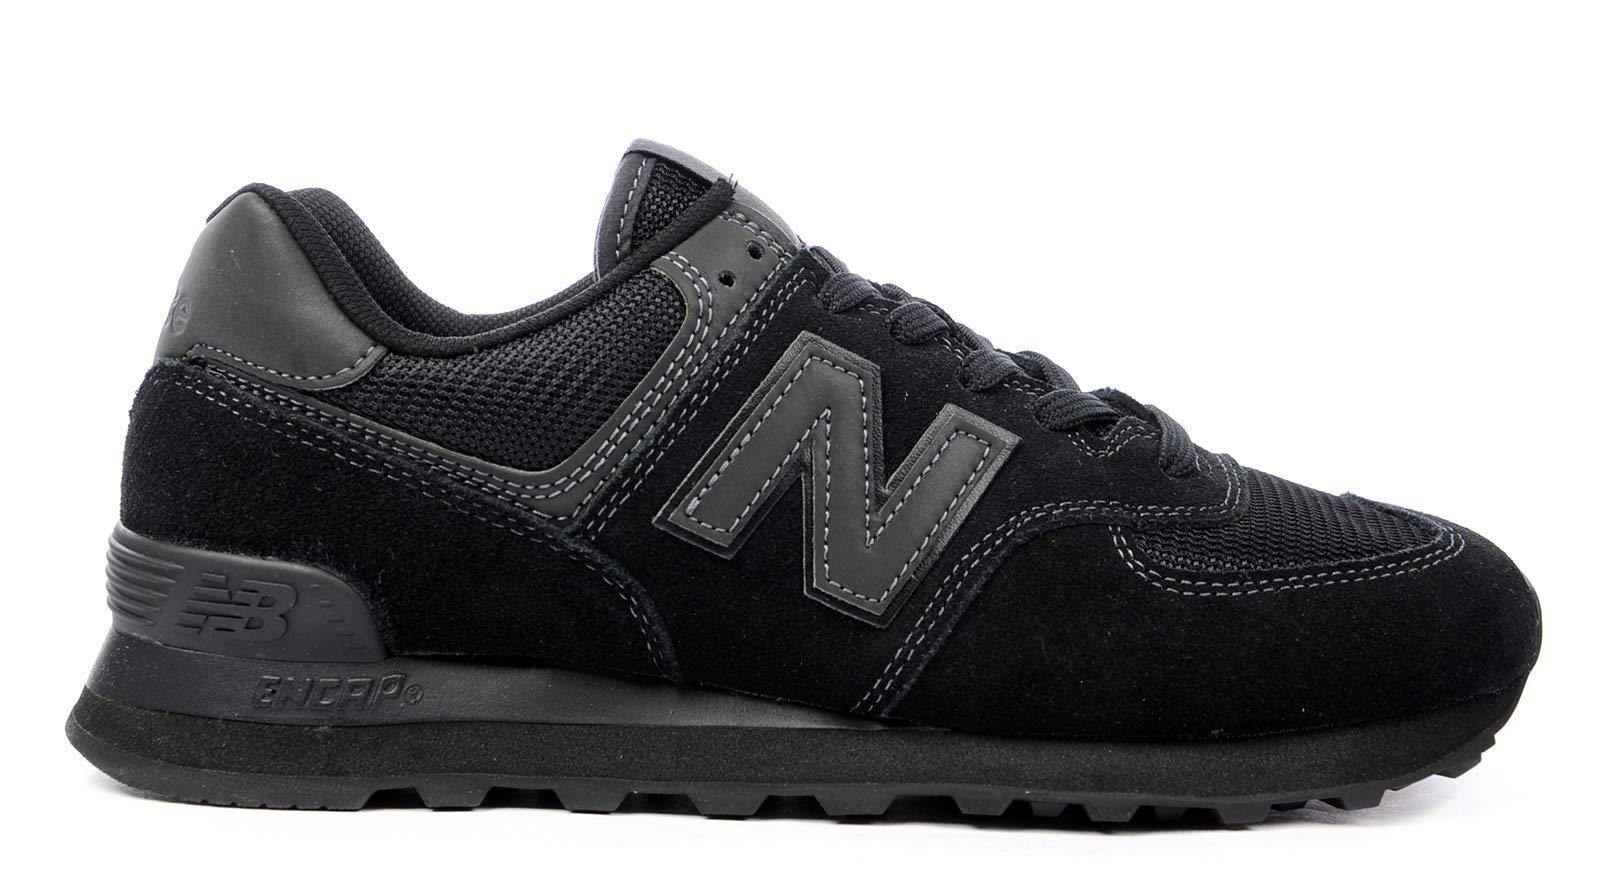 scarpe new balance uomo 574v2